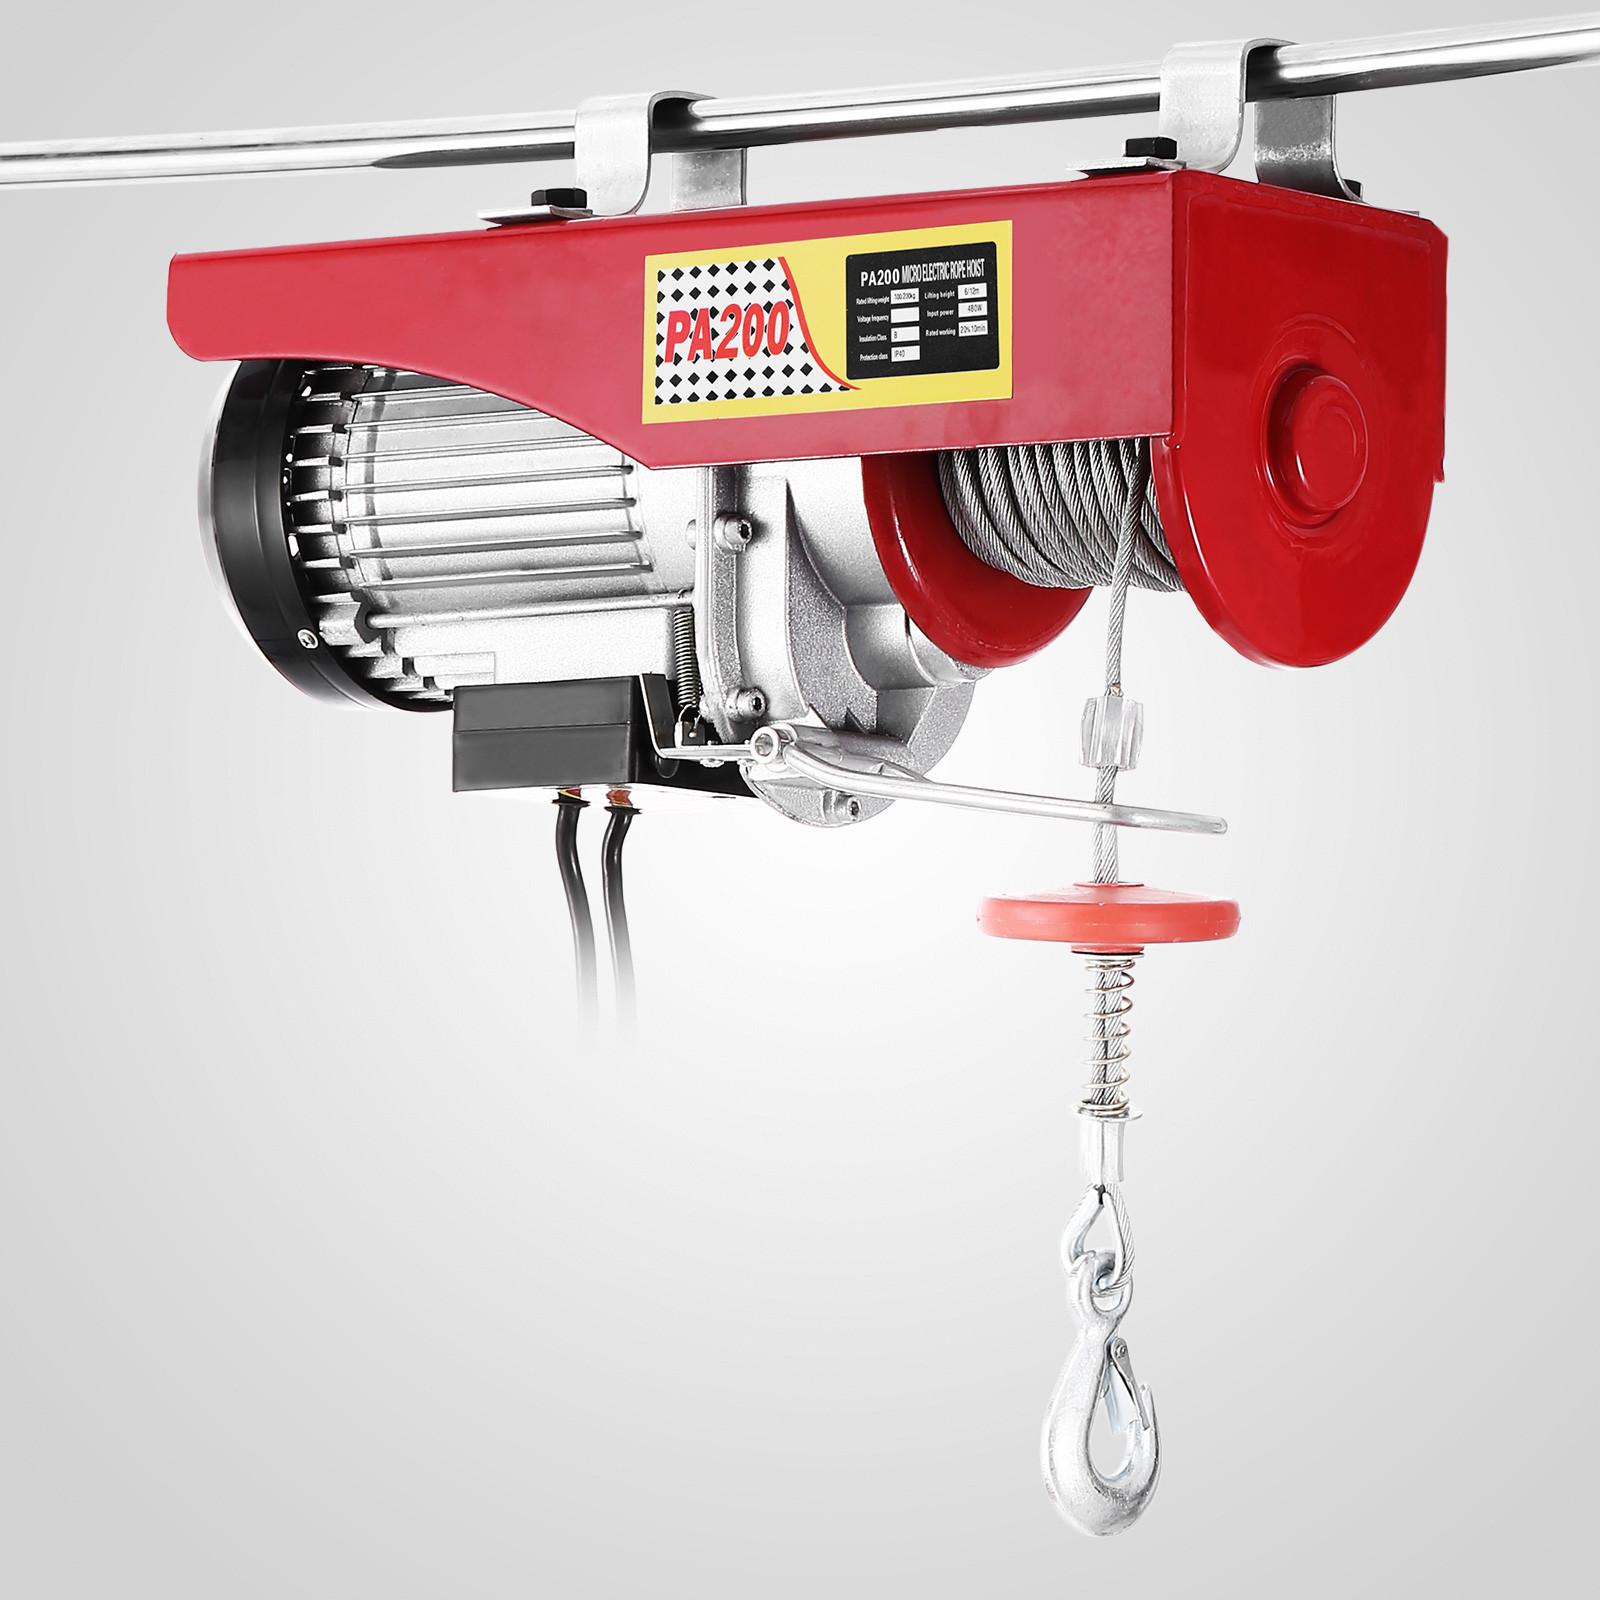 100kg-900kg-Electric-Hoist-Winch-Lifting-Engine-Crane-Cable-Lift-Hook-Garage miniature 15